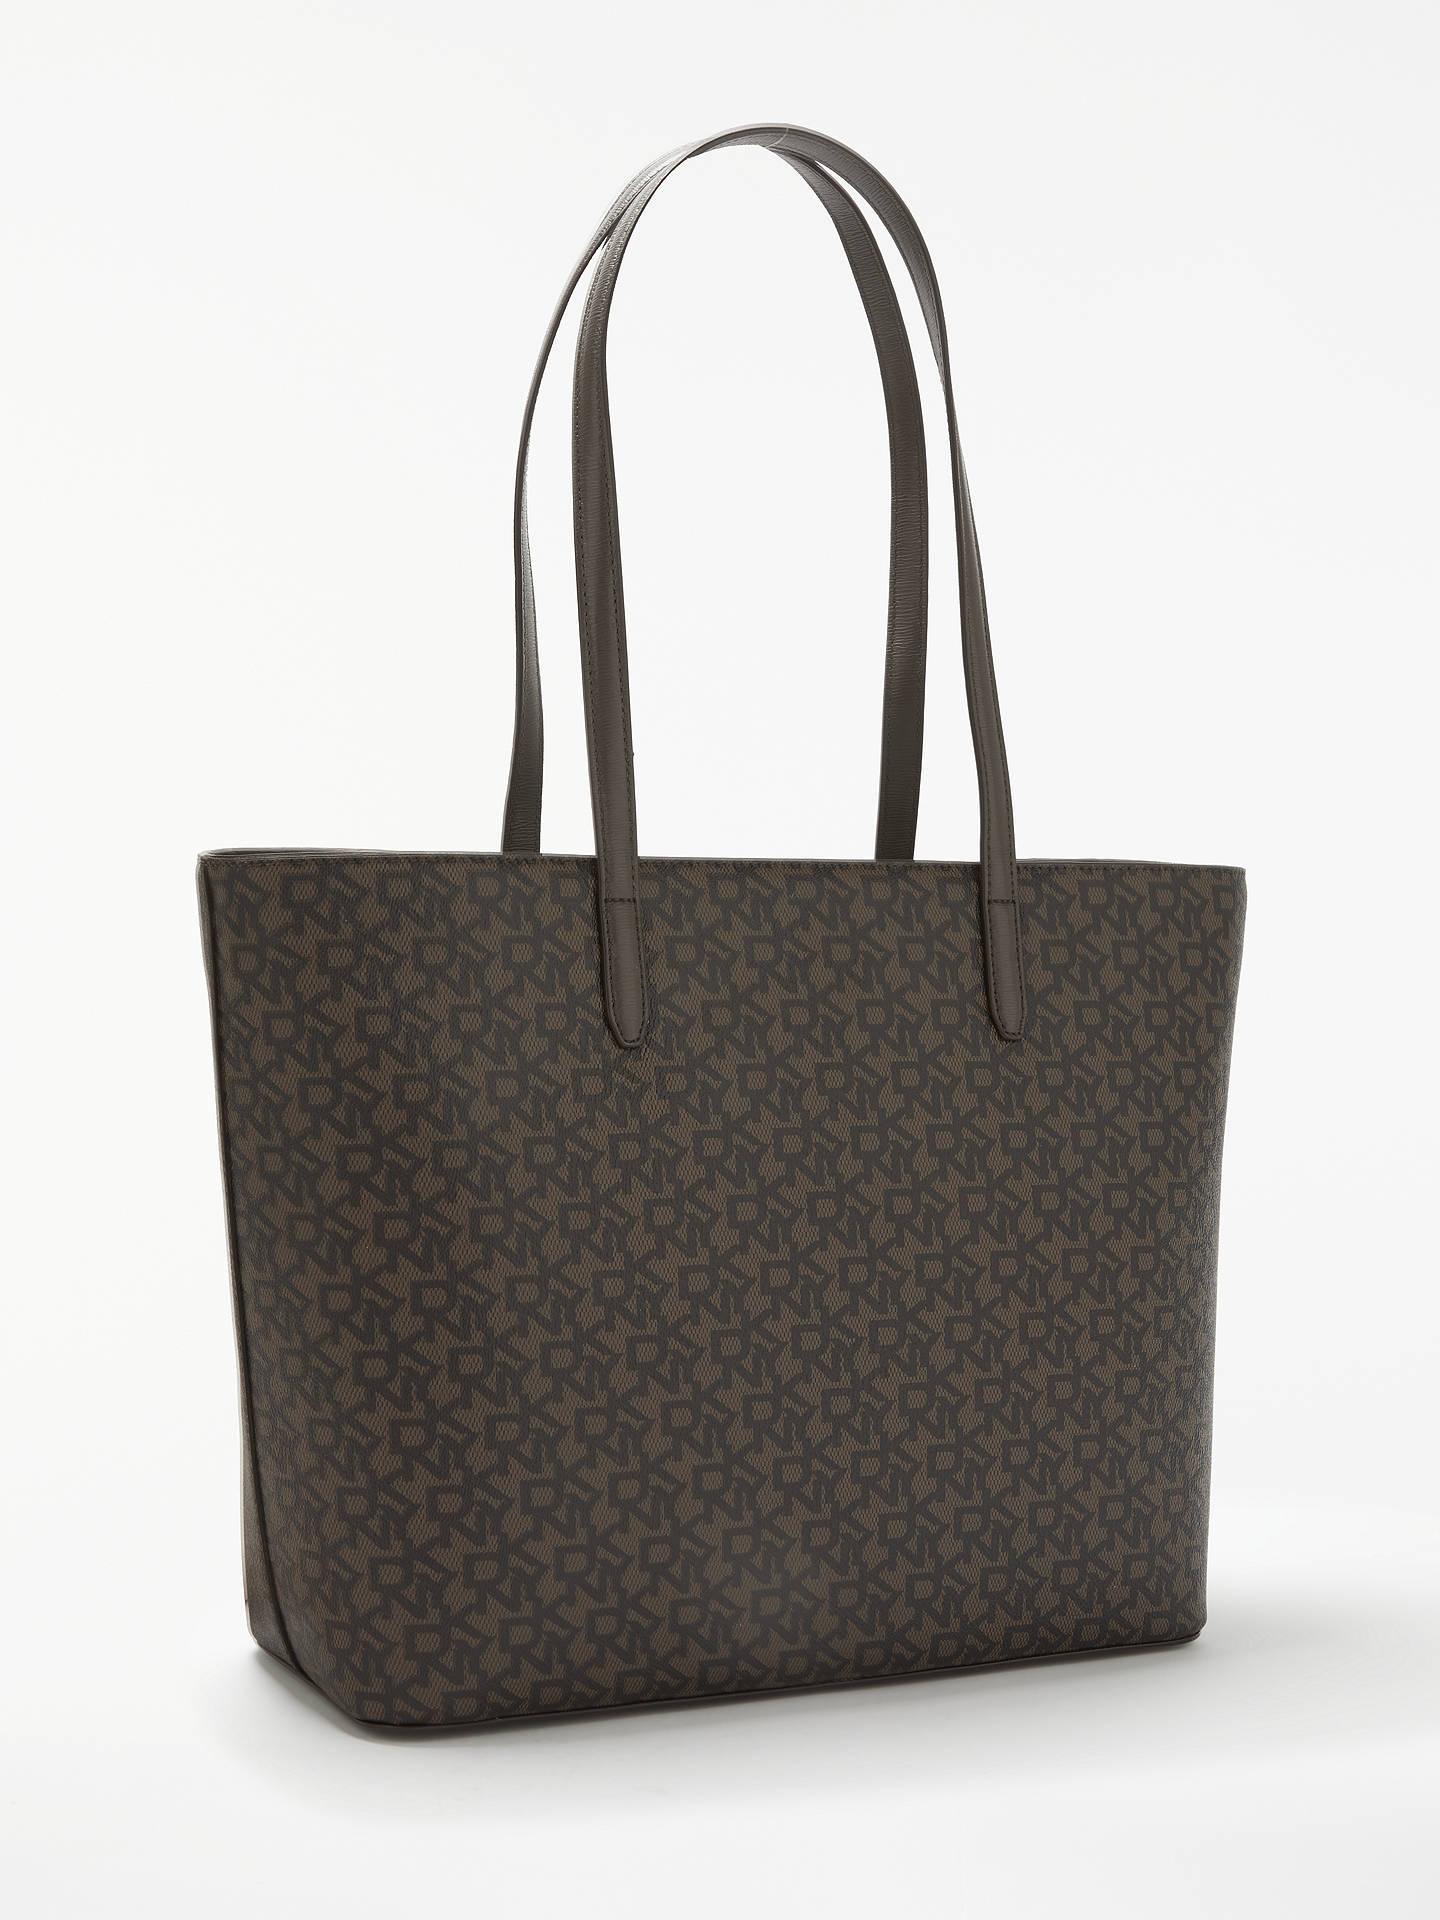 843e0182b ... Buy DKNY Sutton Large Logo Tote Bag, Brown Online at johnlewis.com ...